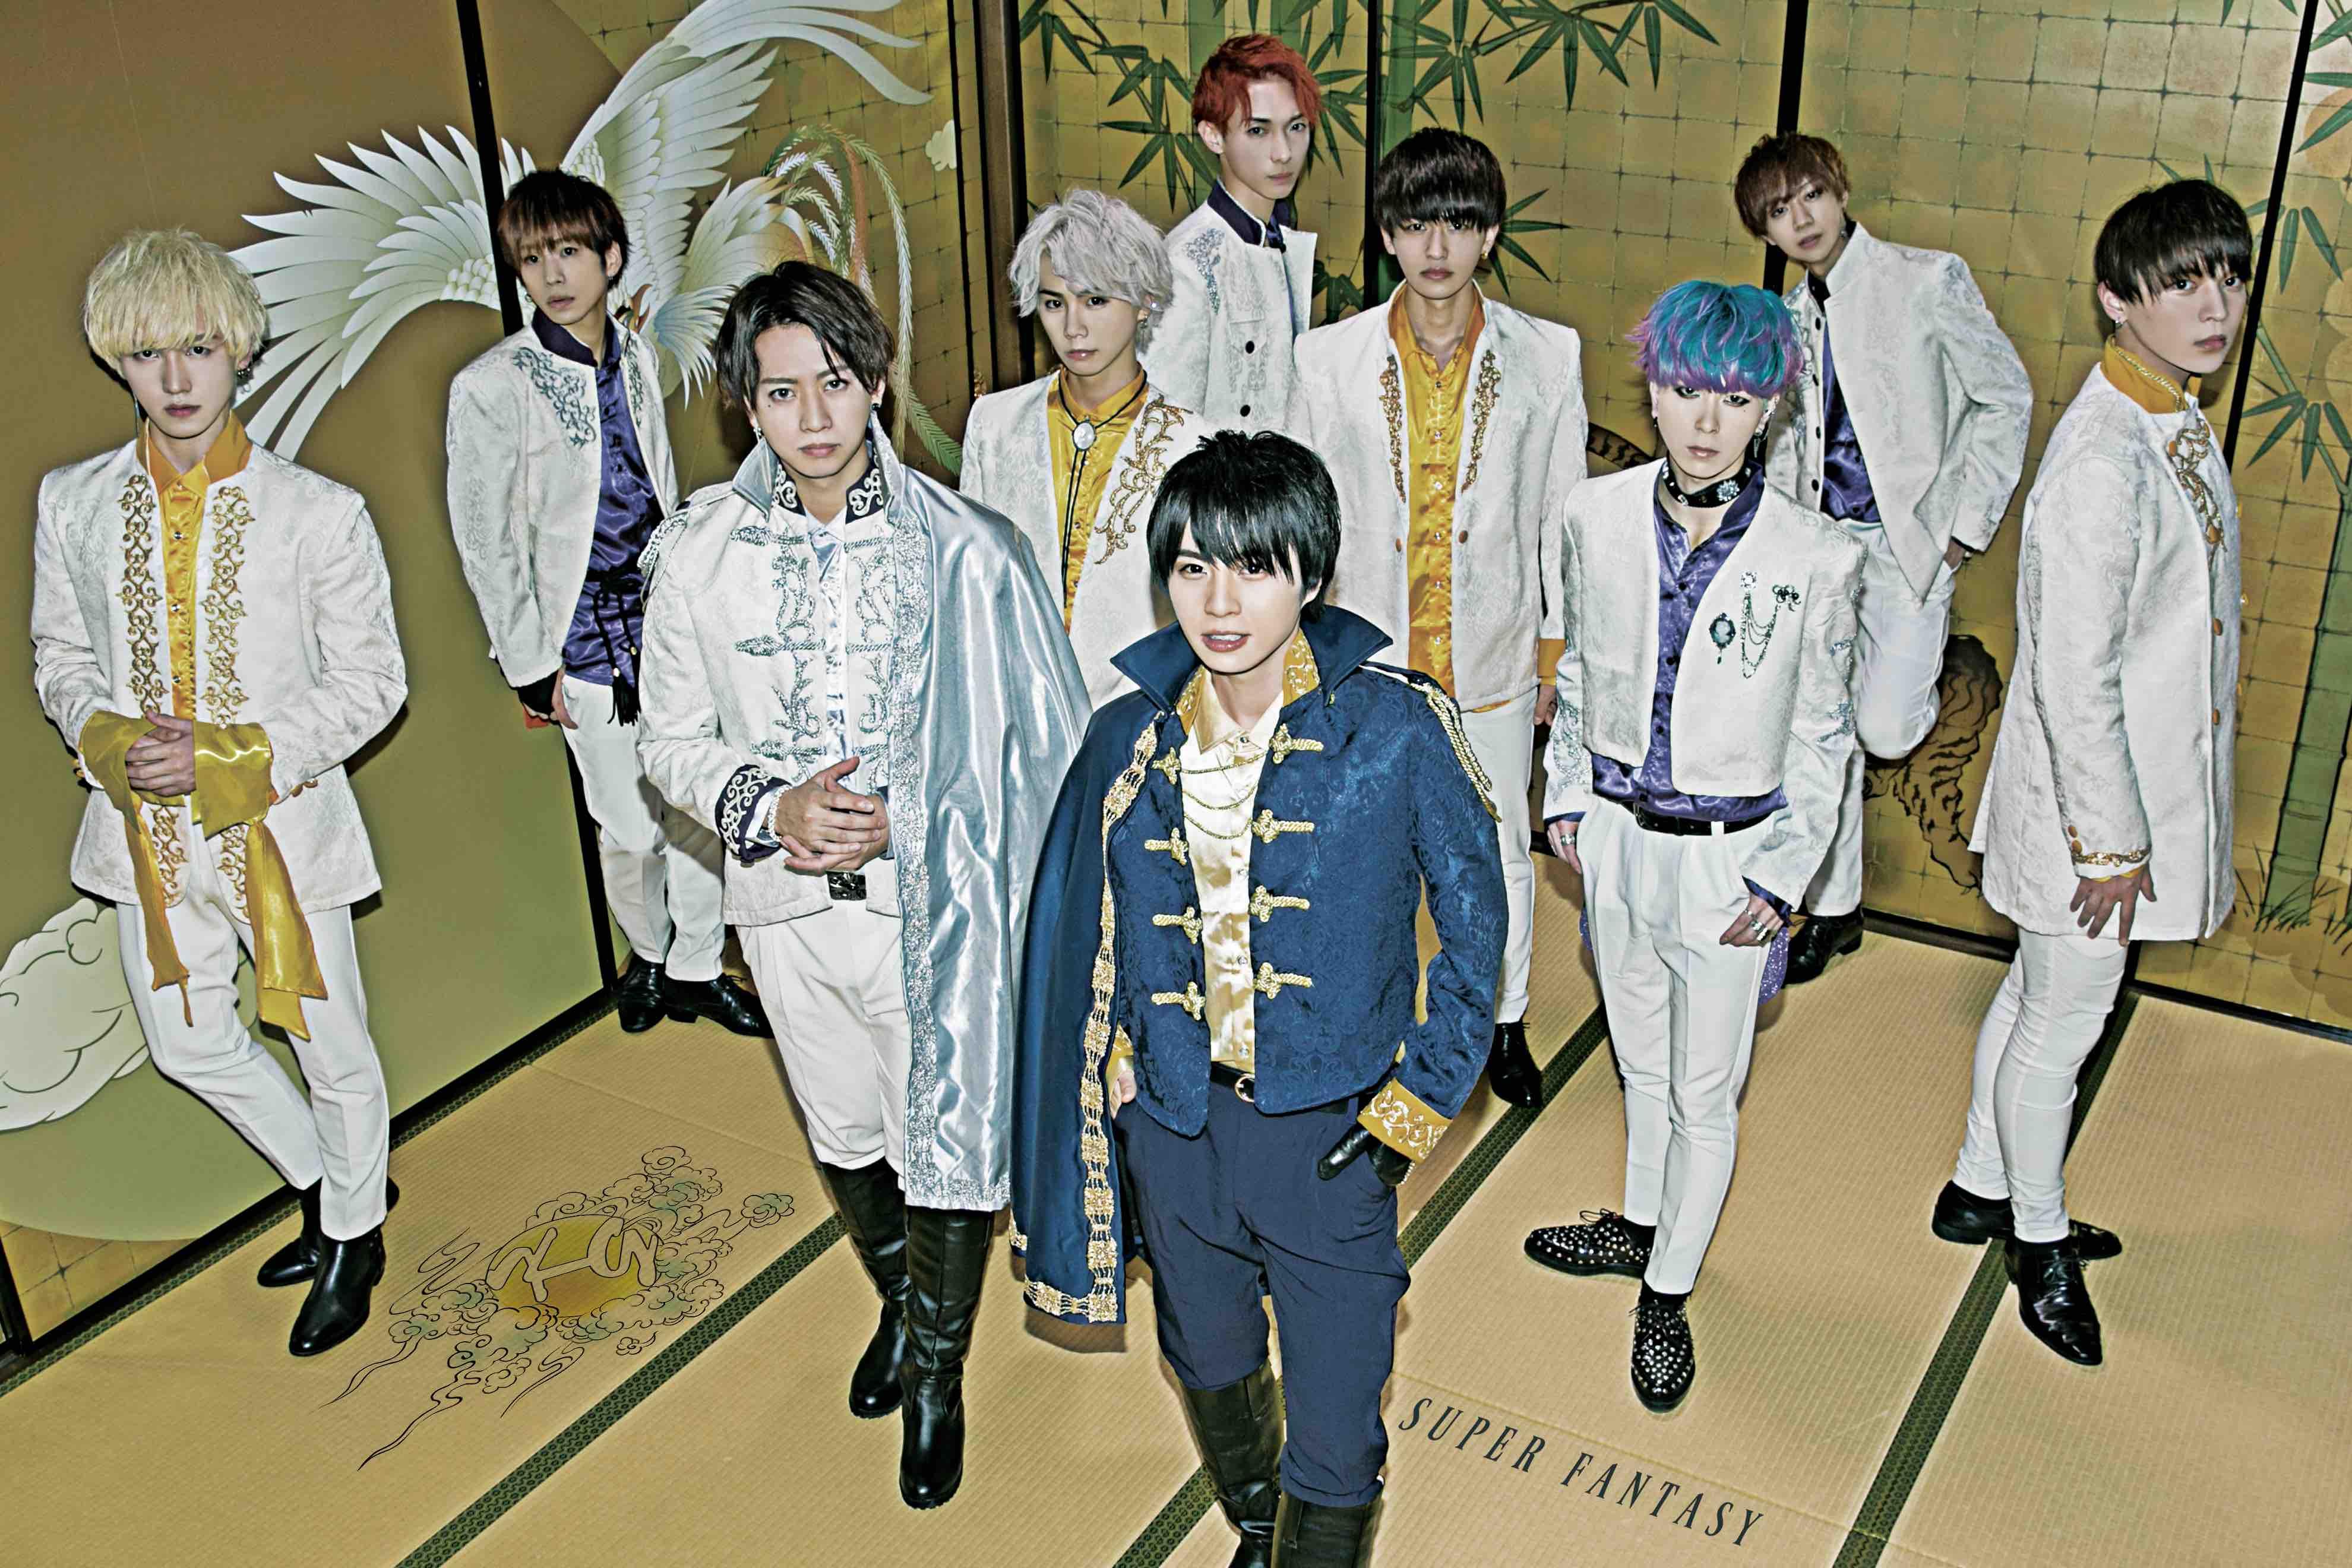 SUPER FANTASYリクエスト公演-DAY1-